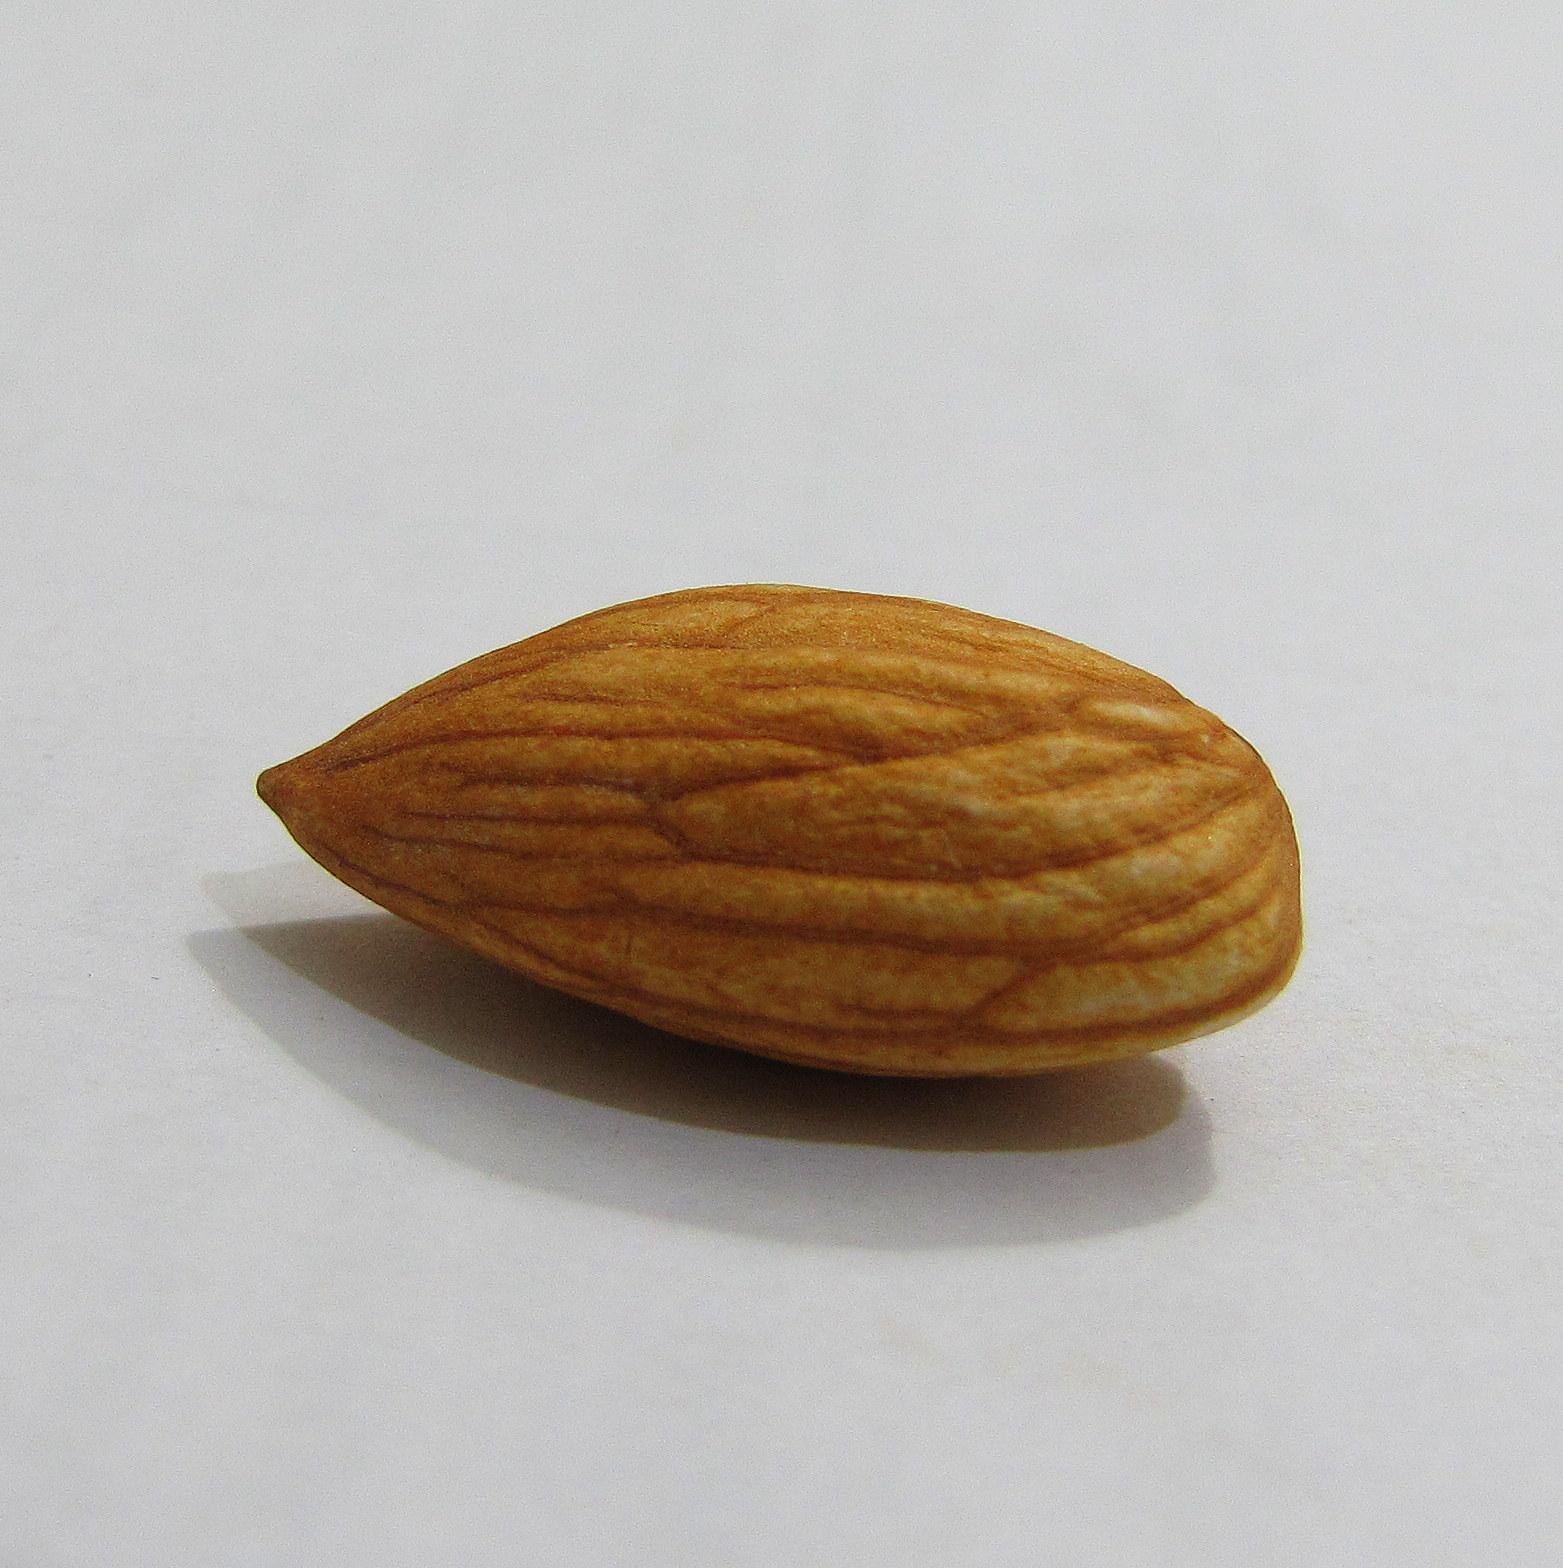 One Almond Almond